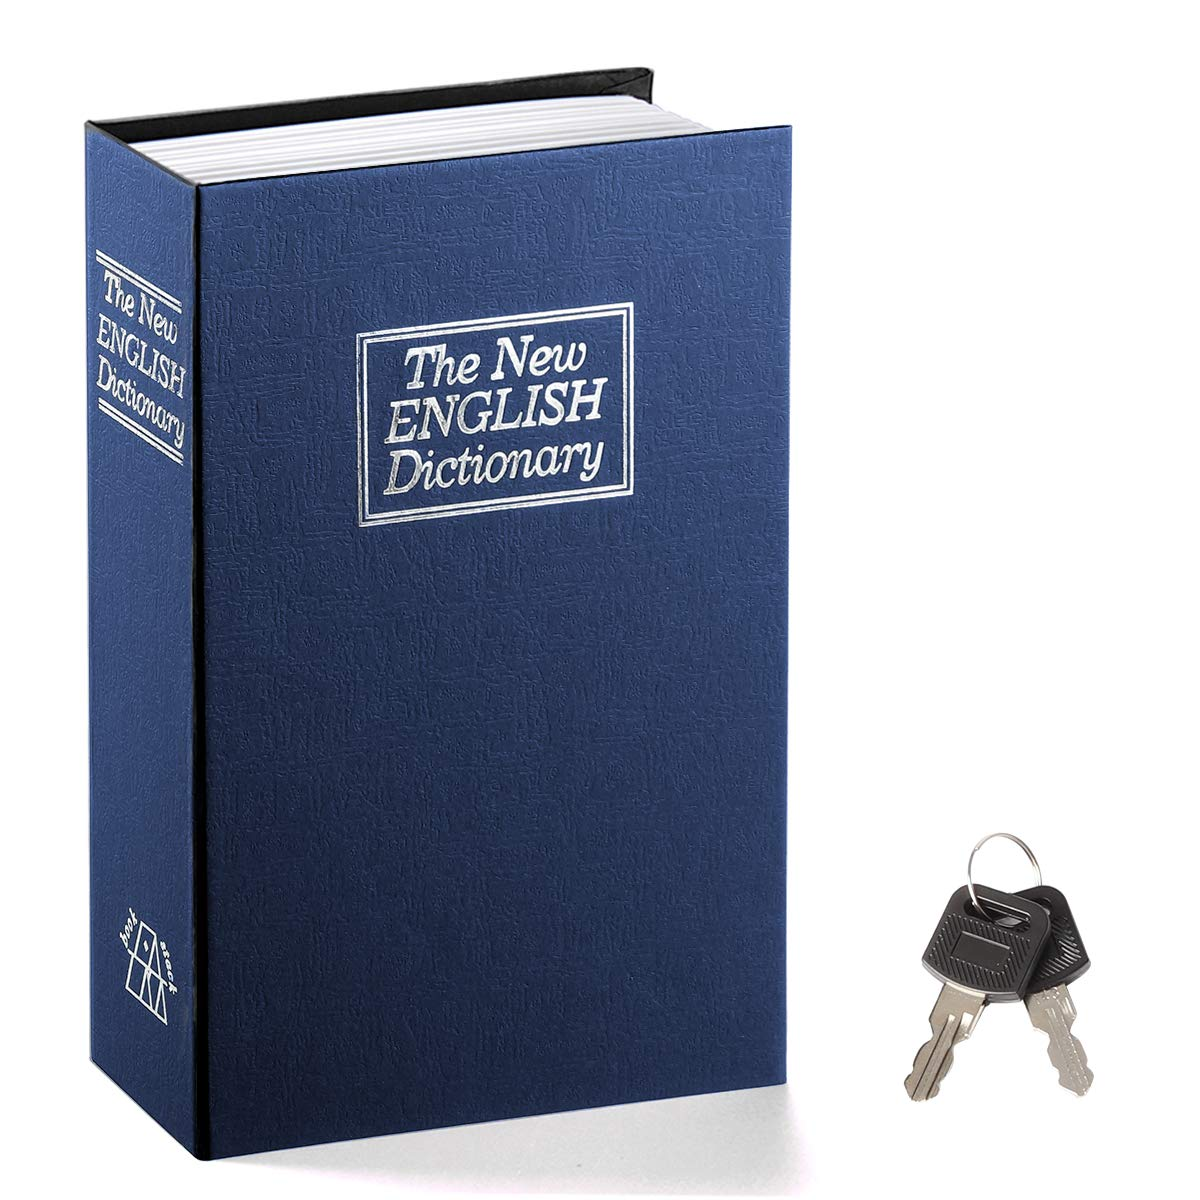 Book Safe withキーロック – jssmstホーム辞書Diversionセーフロックボックス2018メタルボックス、Large、sm-bs014 L ブルー B07G4X6J57